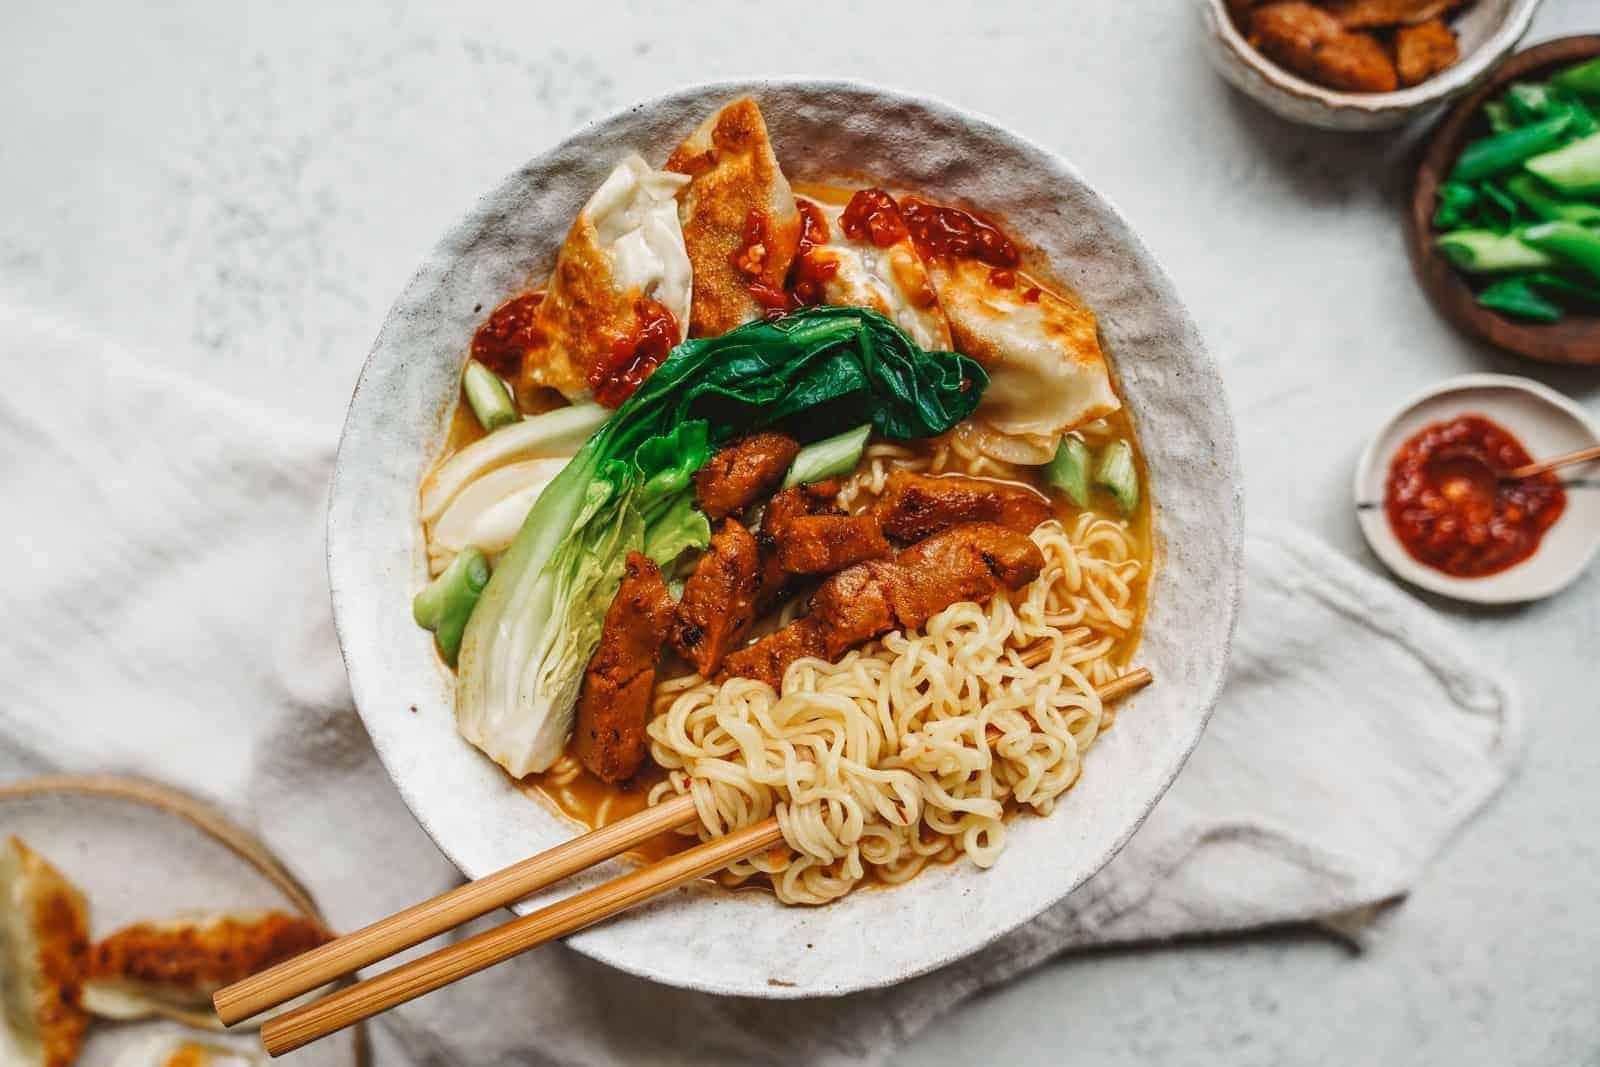 Big bowl of creamy, vegan ramen